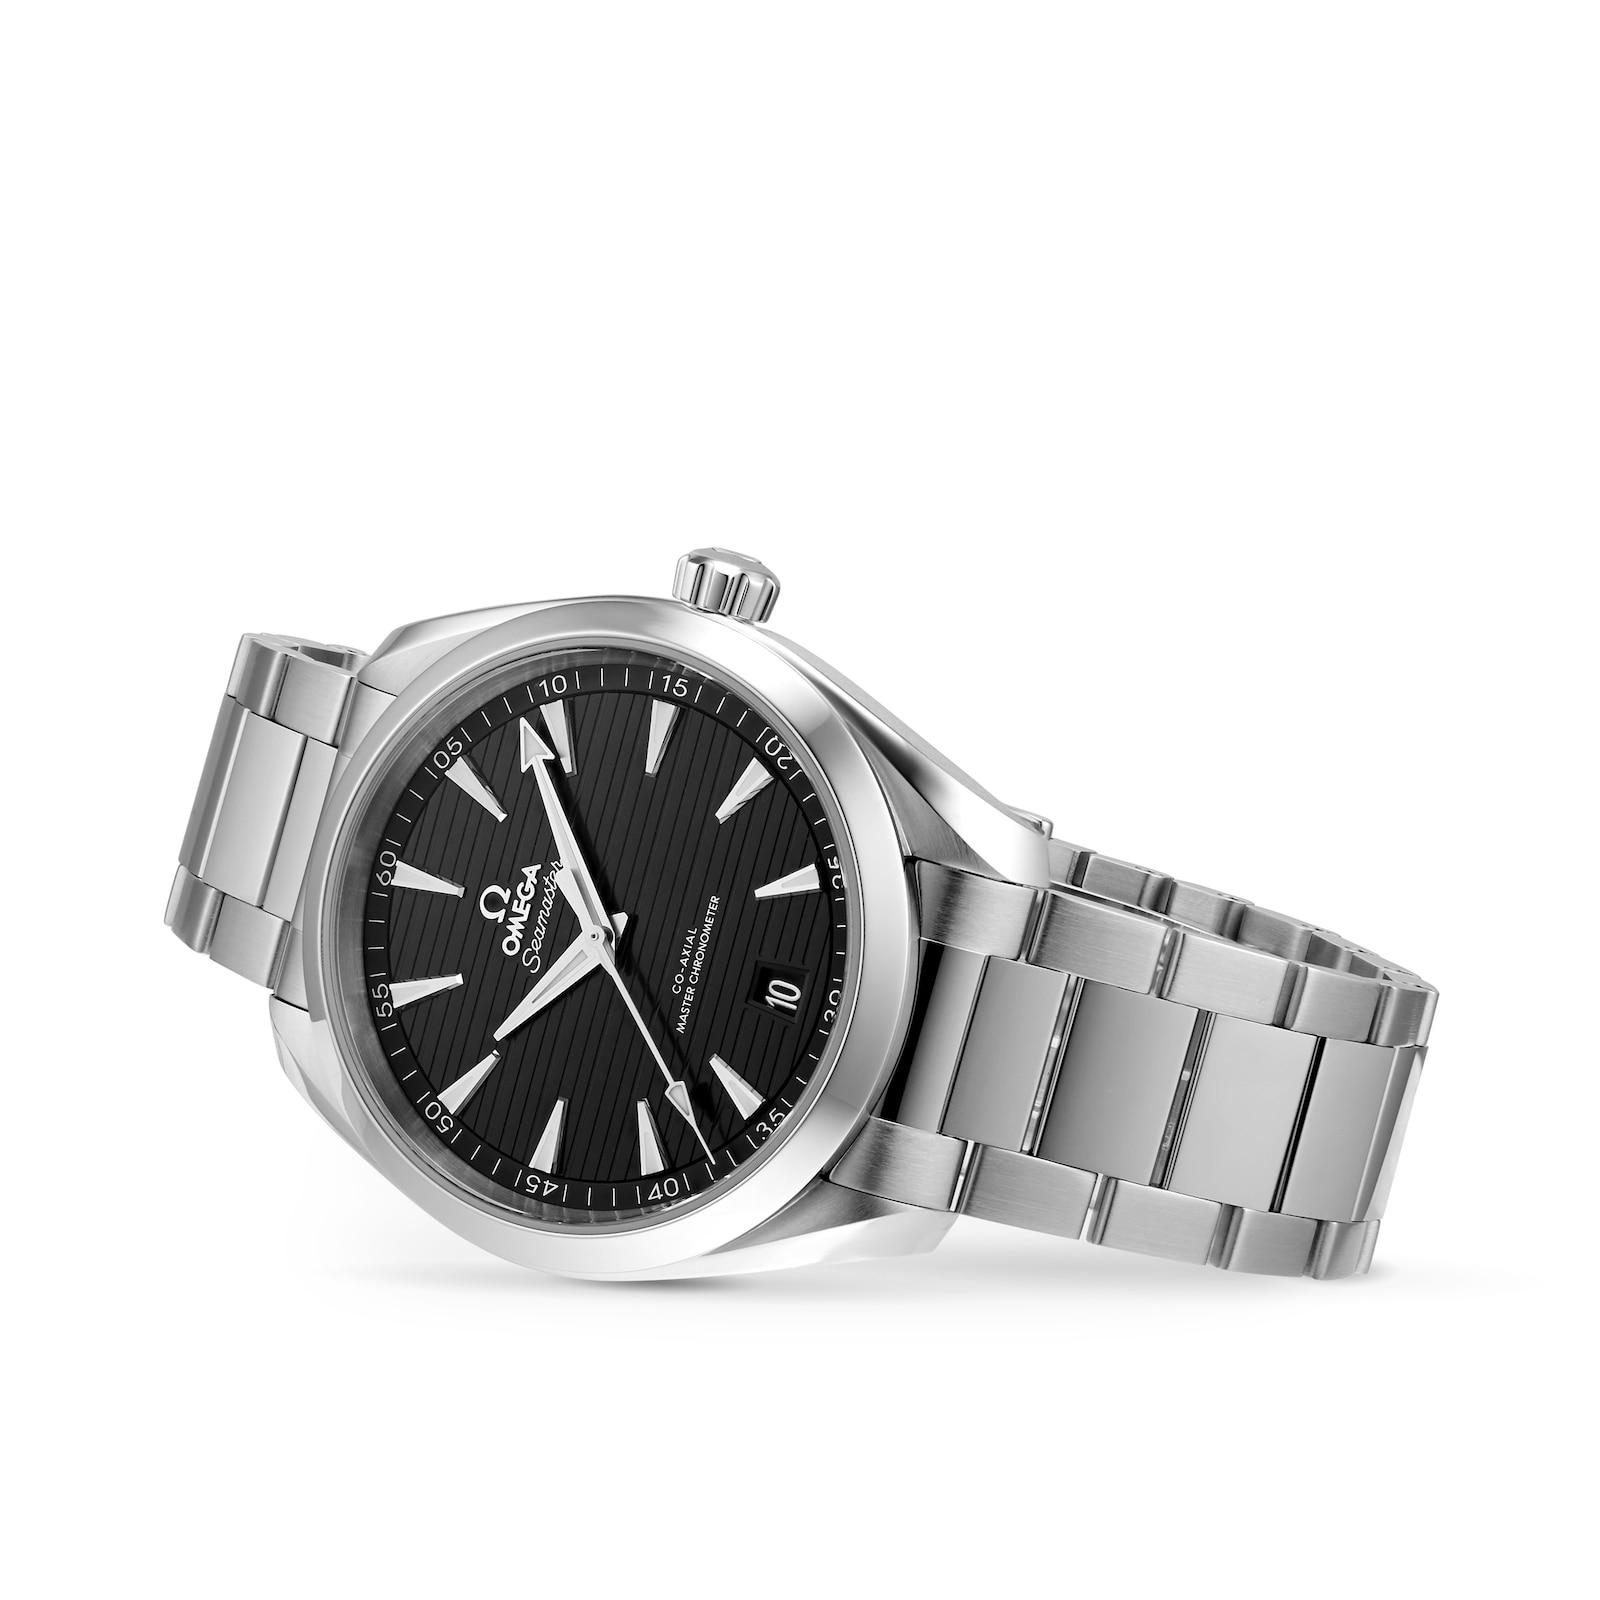 Omega Seamaster Aqua Terra 150M Mens Black Dial 41mm Automatic Co-Axial Watch